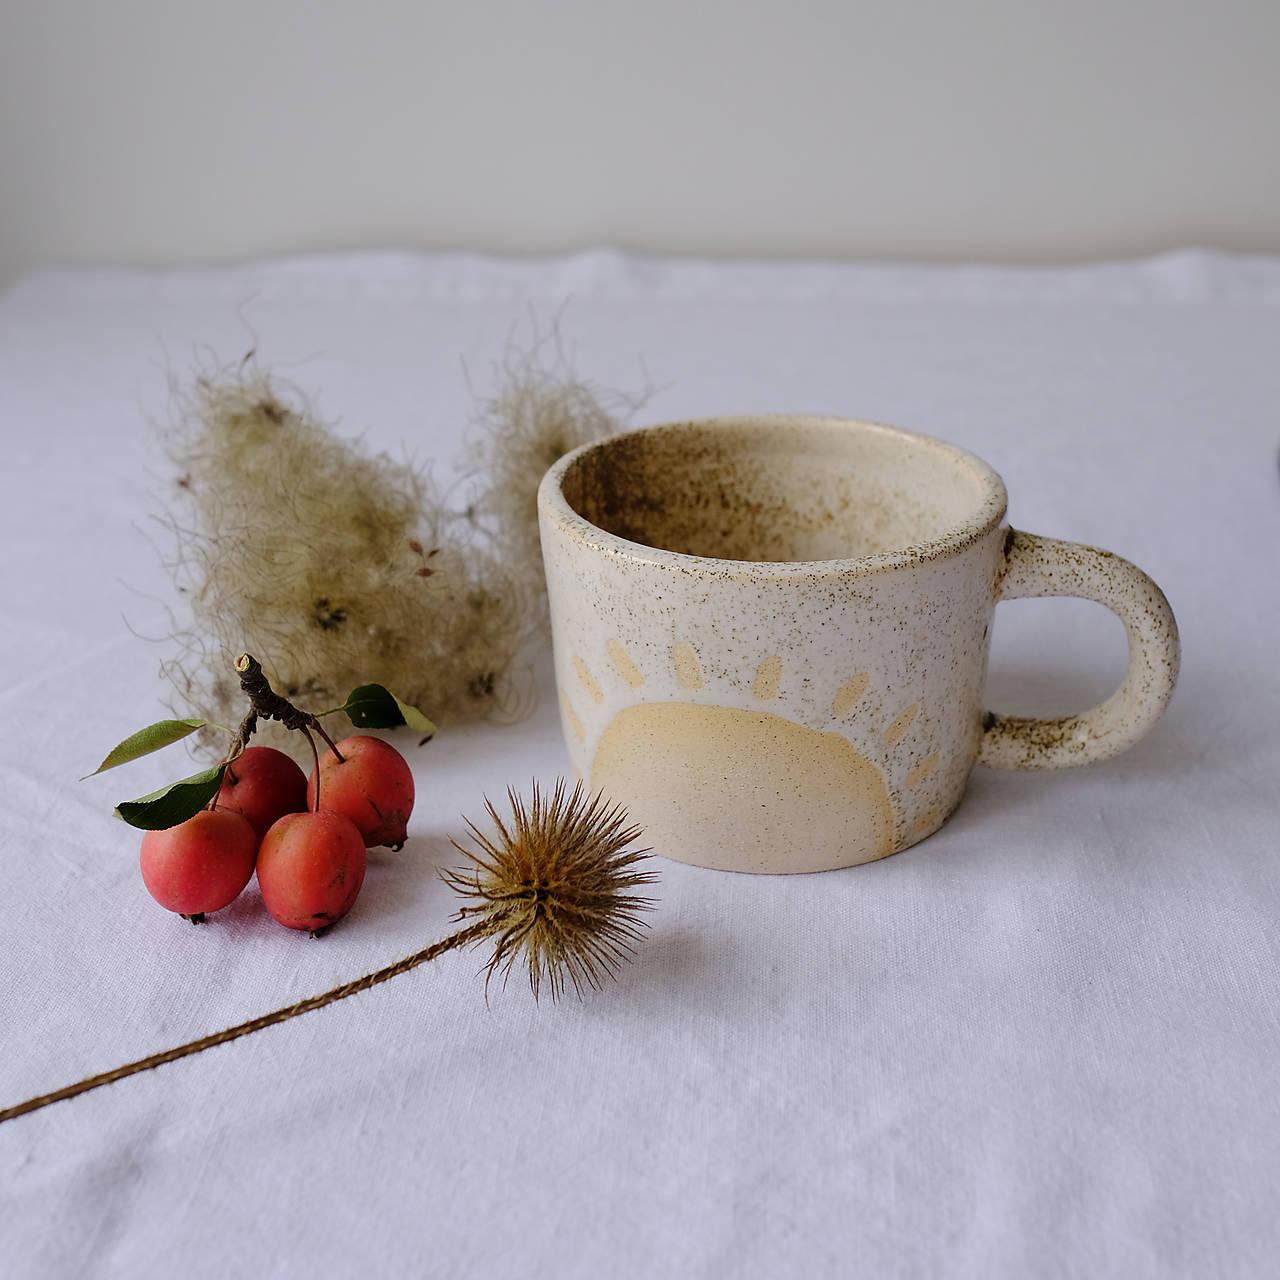 Nádoby - Hrnček kolekcia Piesok (Slnko) - 12441846_